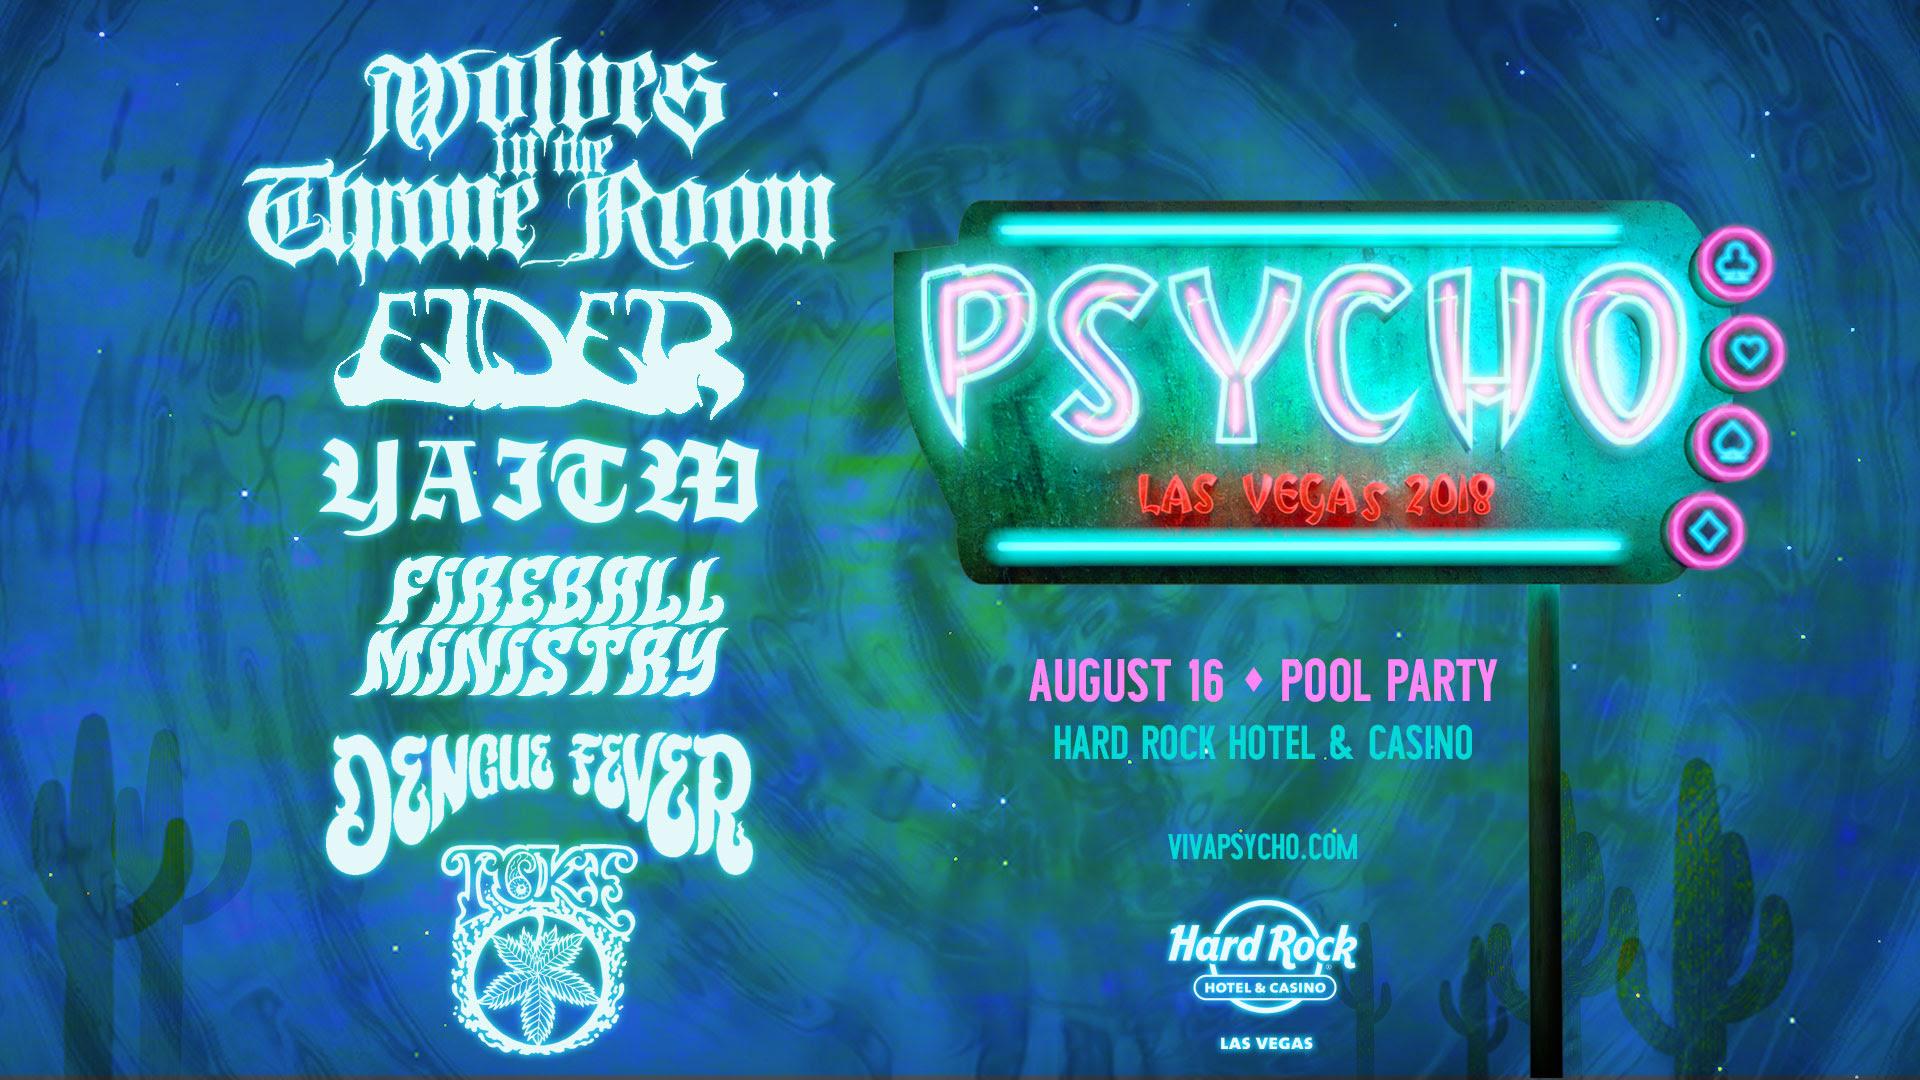 psycho las vegas 2018 pool party